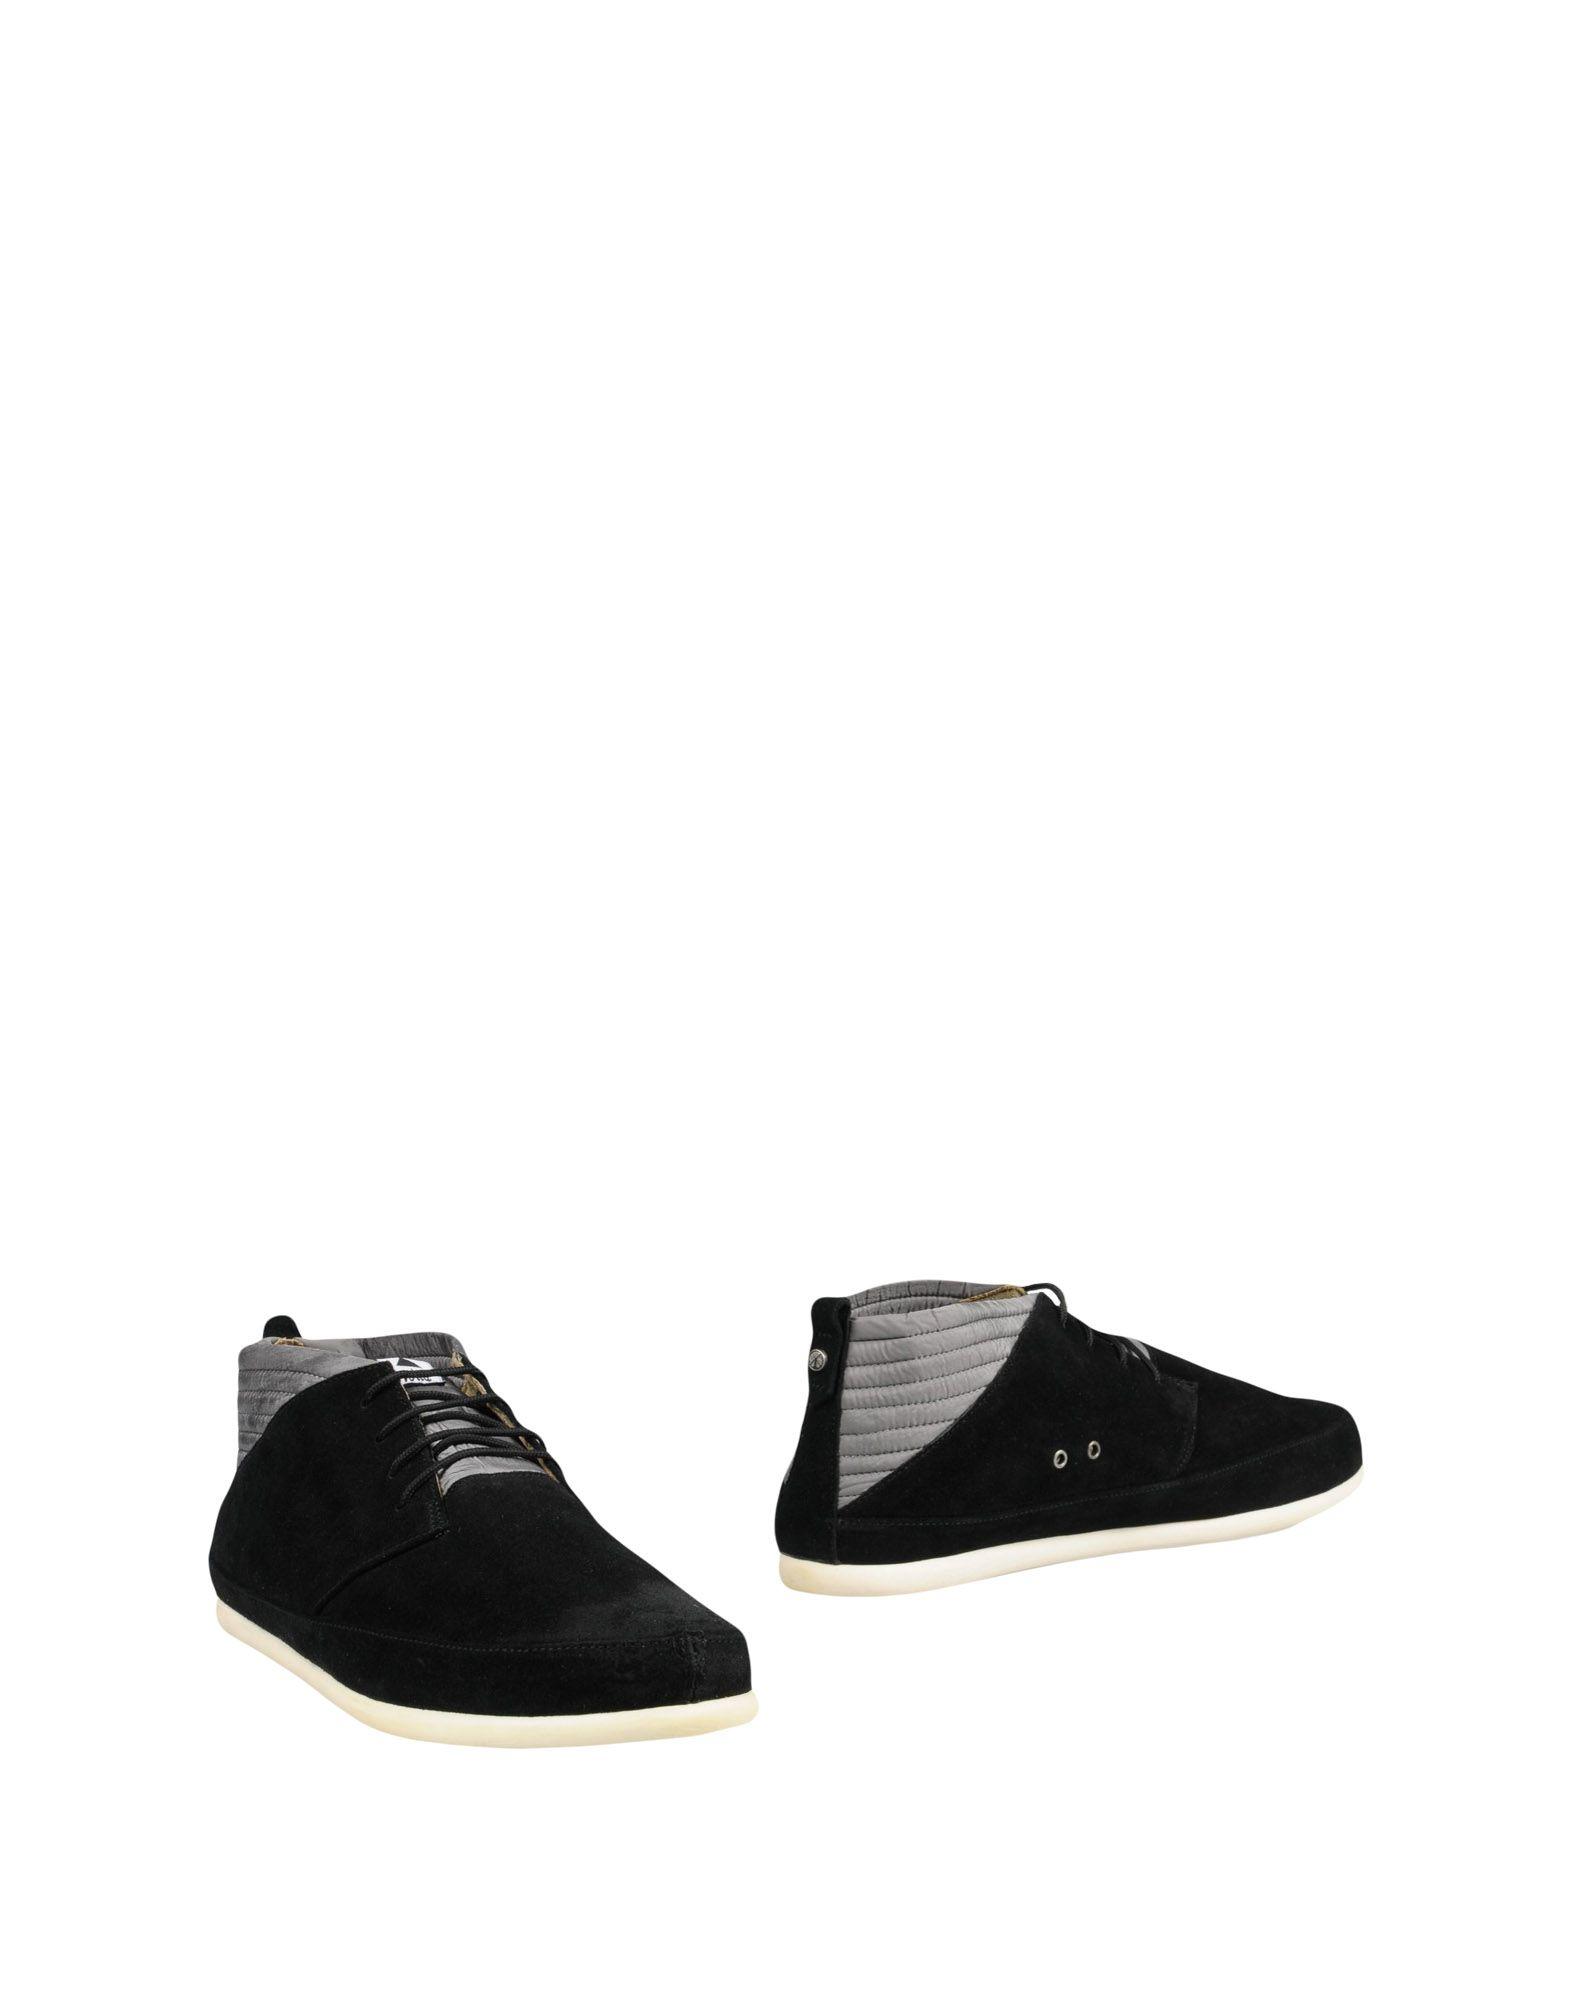 VOLTA Boots in Black